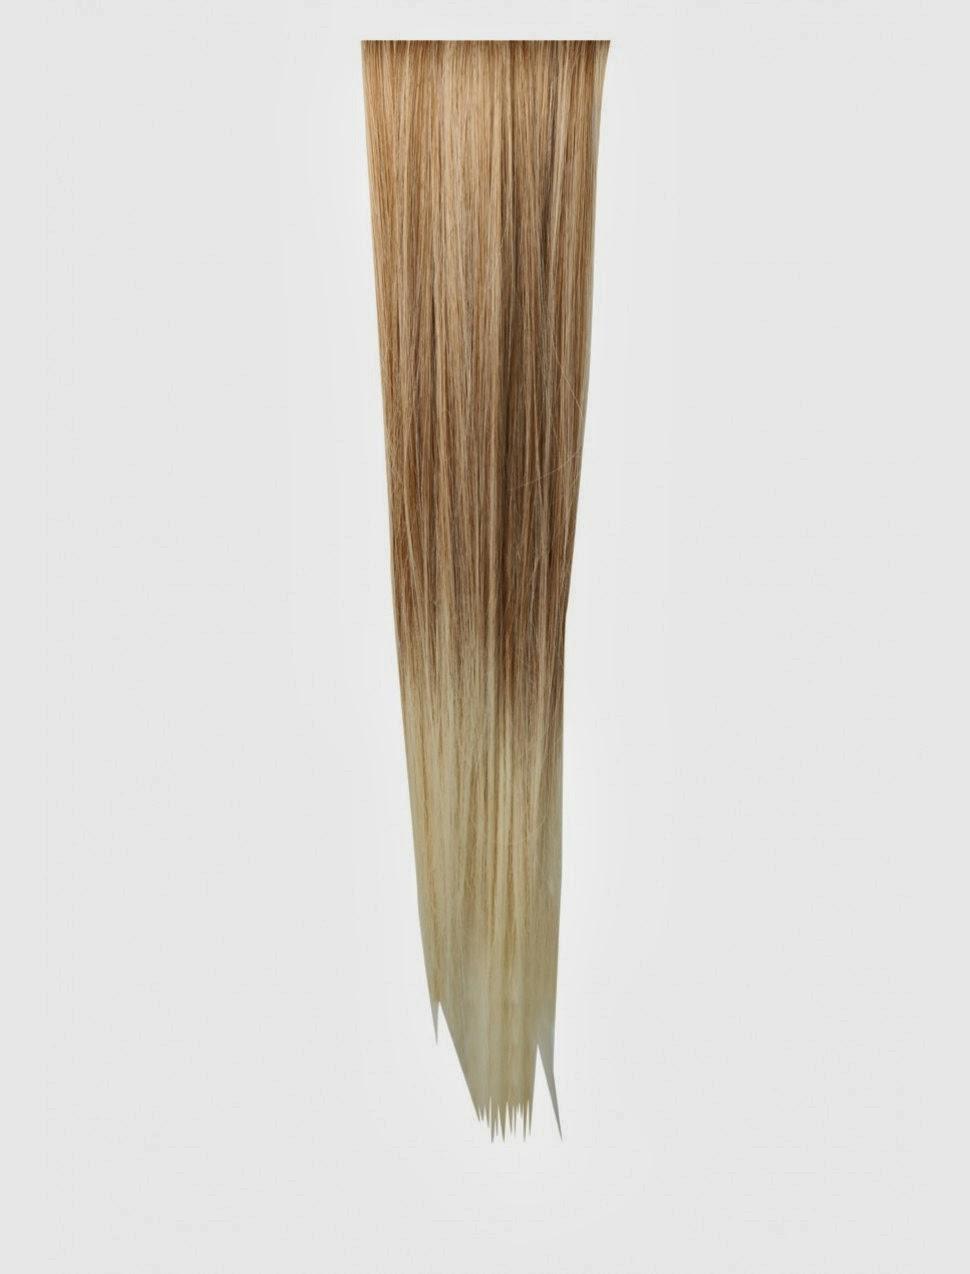 Kira Bassett Hair Extensions ReviewFirst Impressions